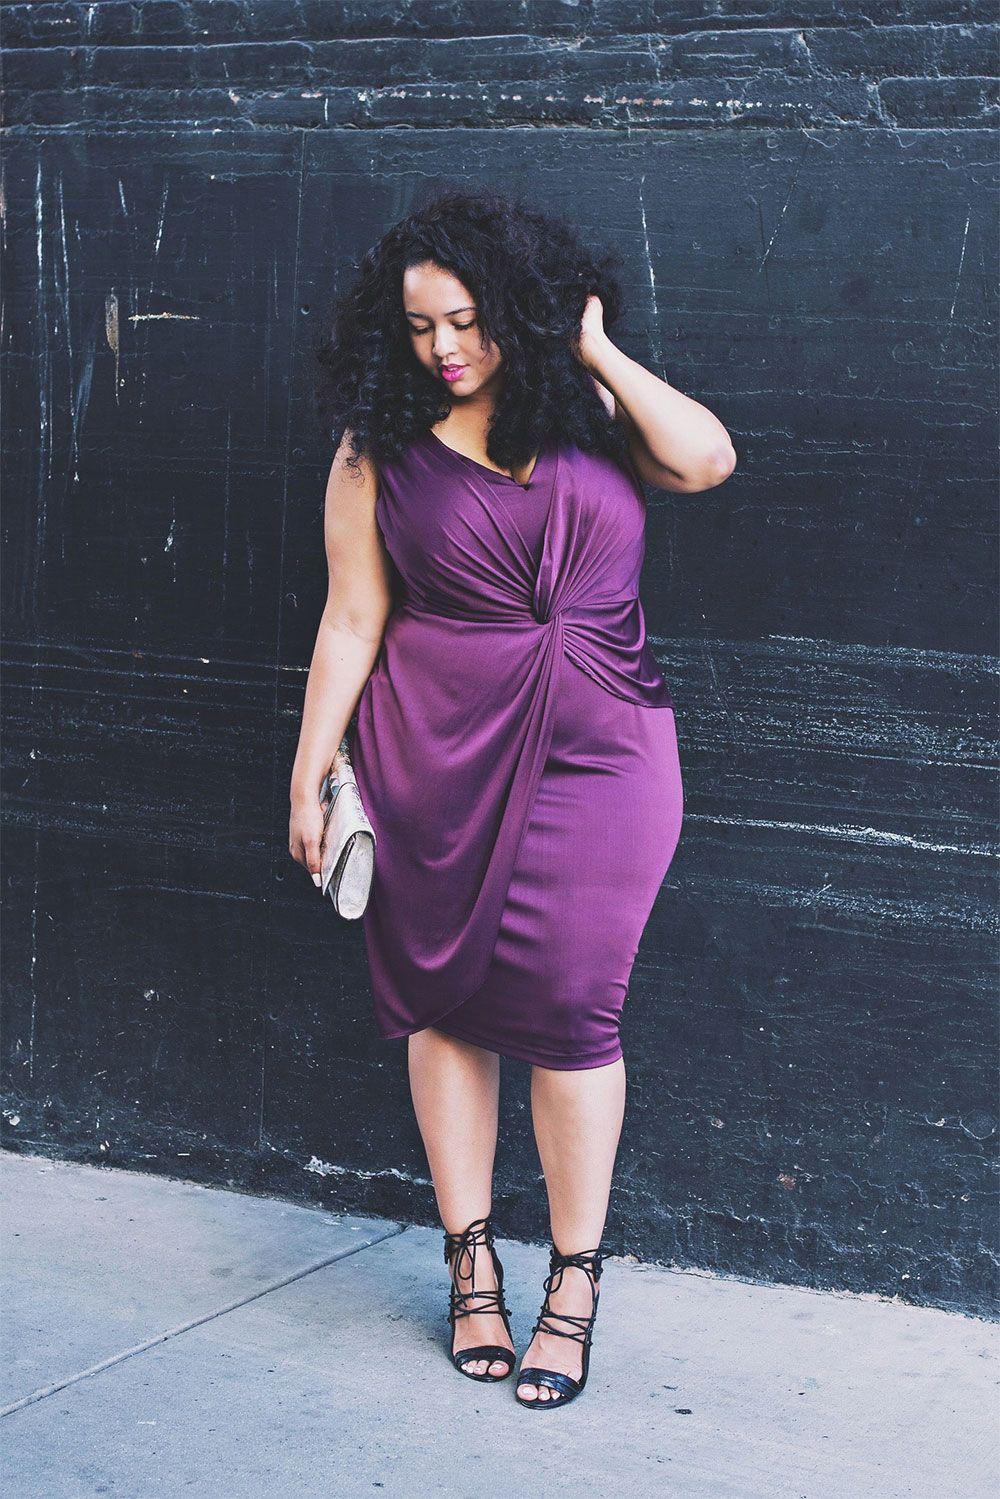 Plus Size Fashion - Gabi Fresh | Plus Size Fashion | Pinterest ...